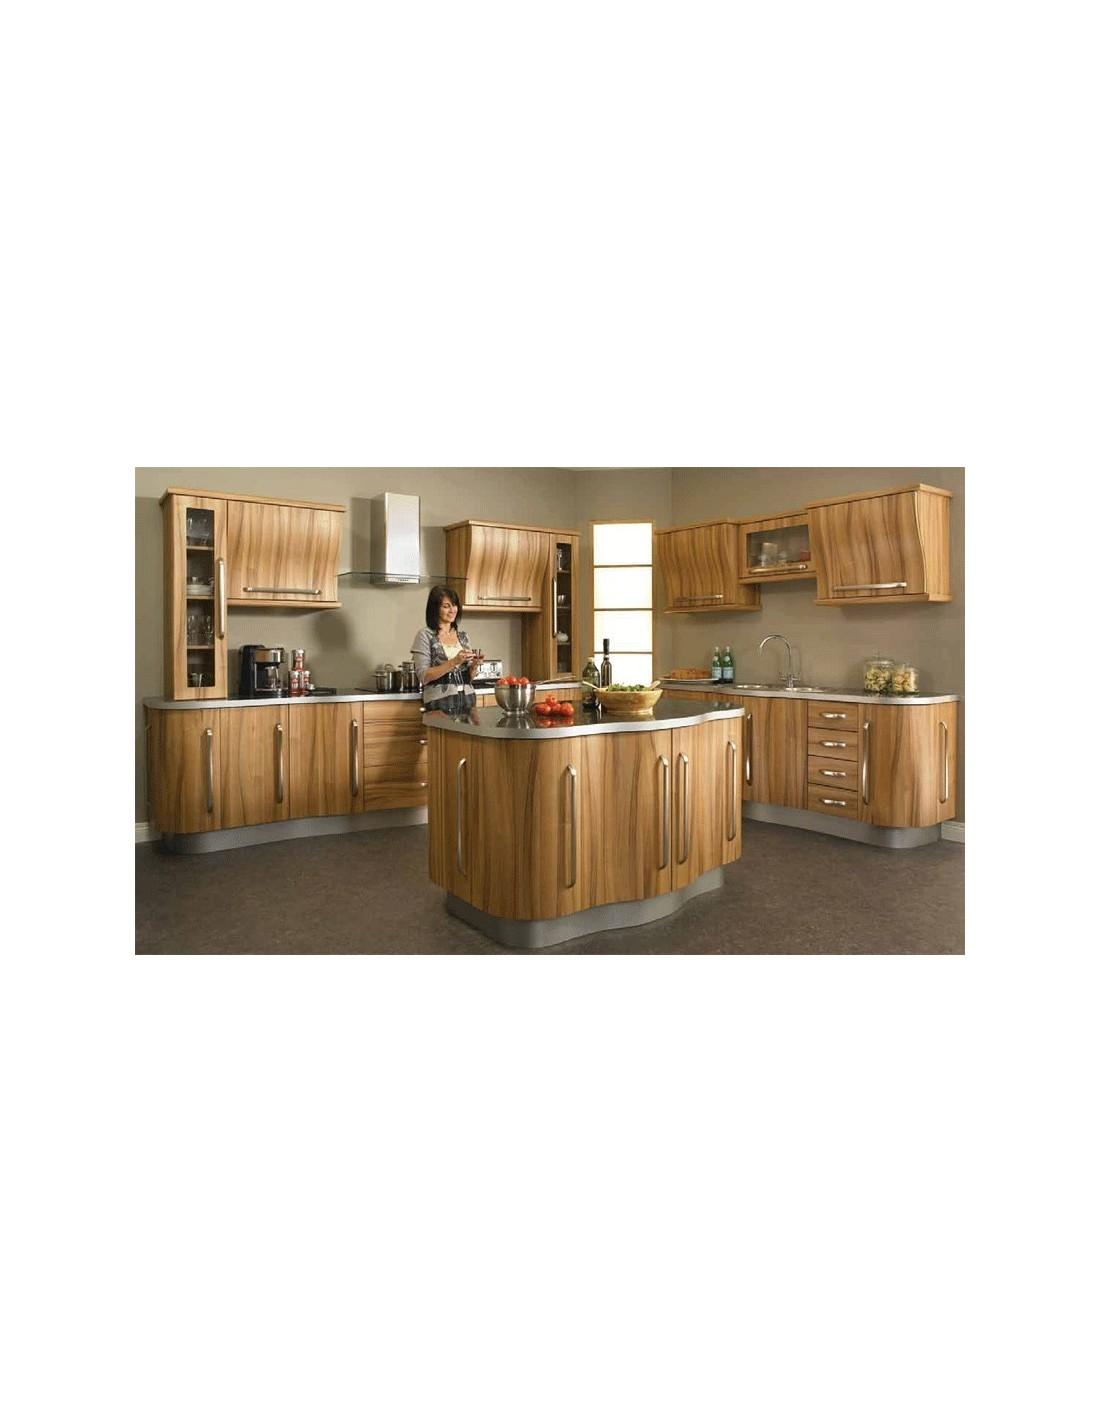 Duleek light tiepolo woodgrain modern kitchen doors units for Wood grain kitchen doors